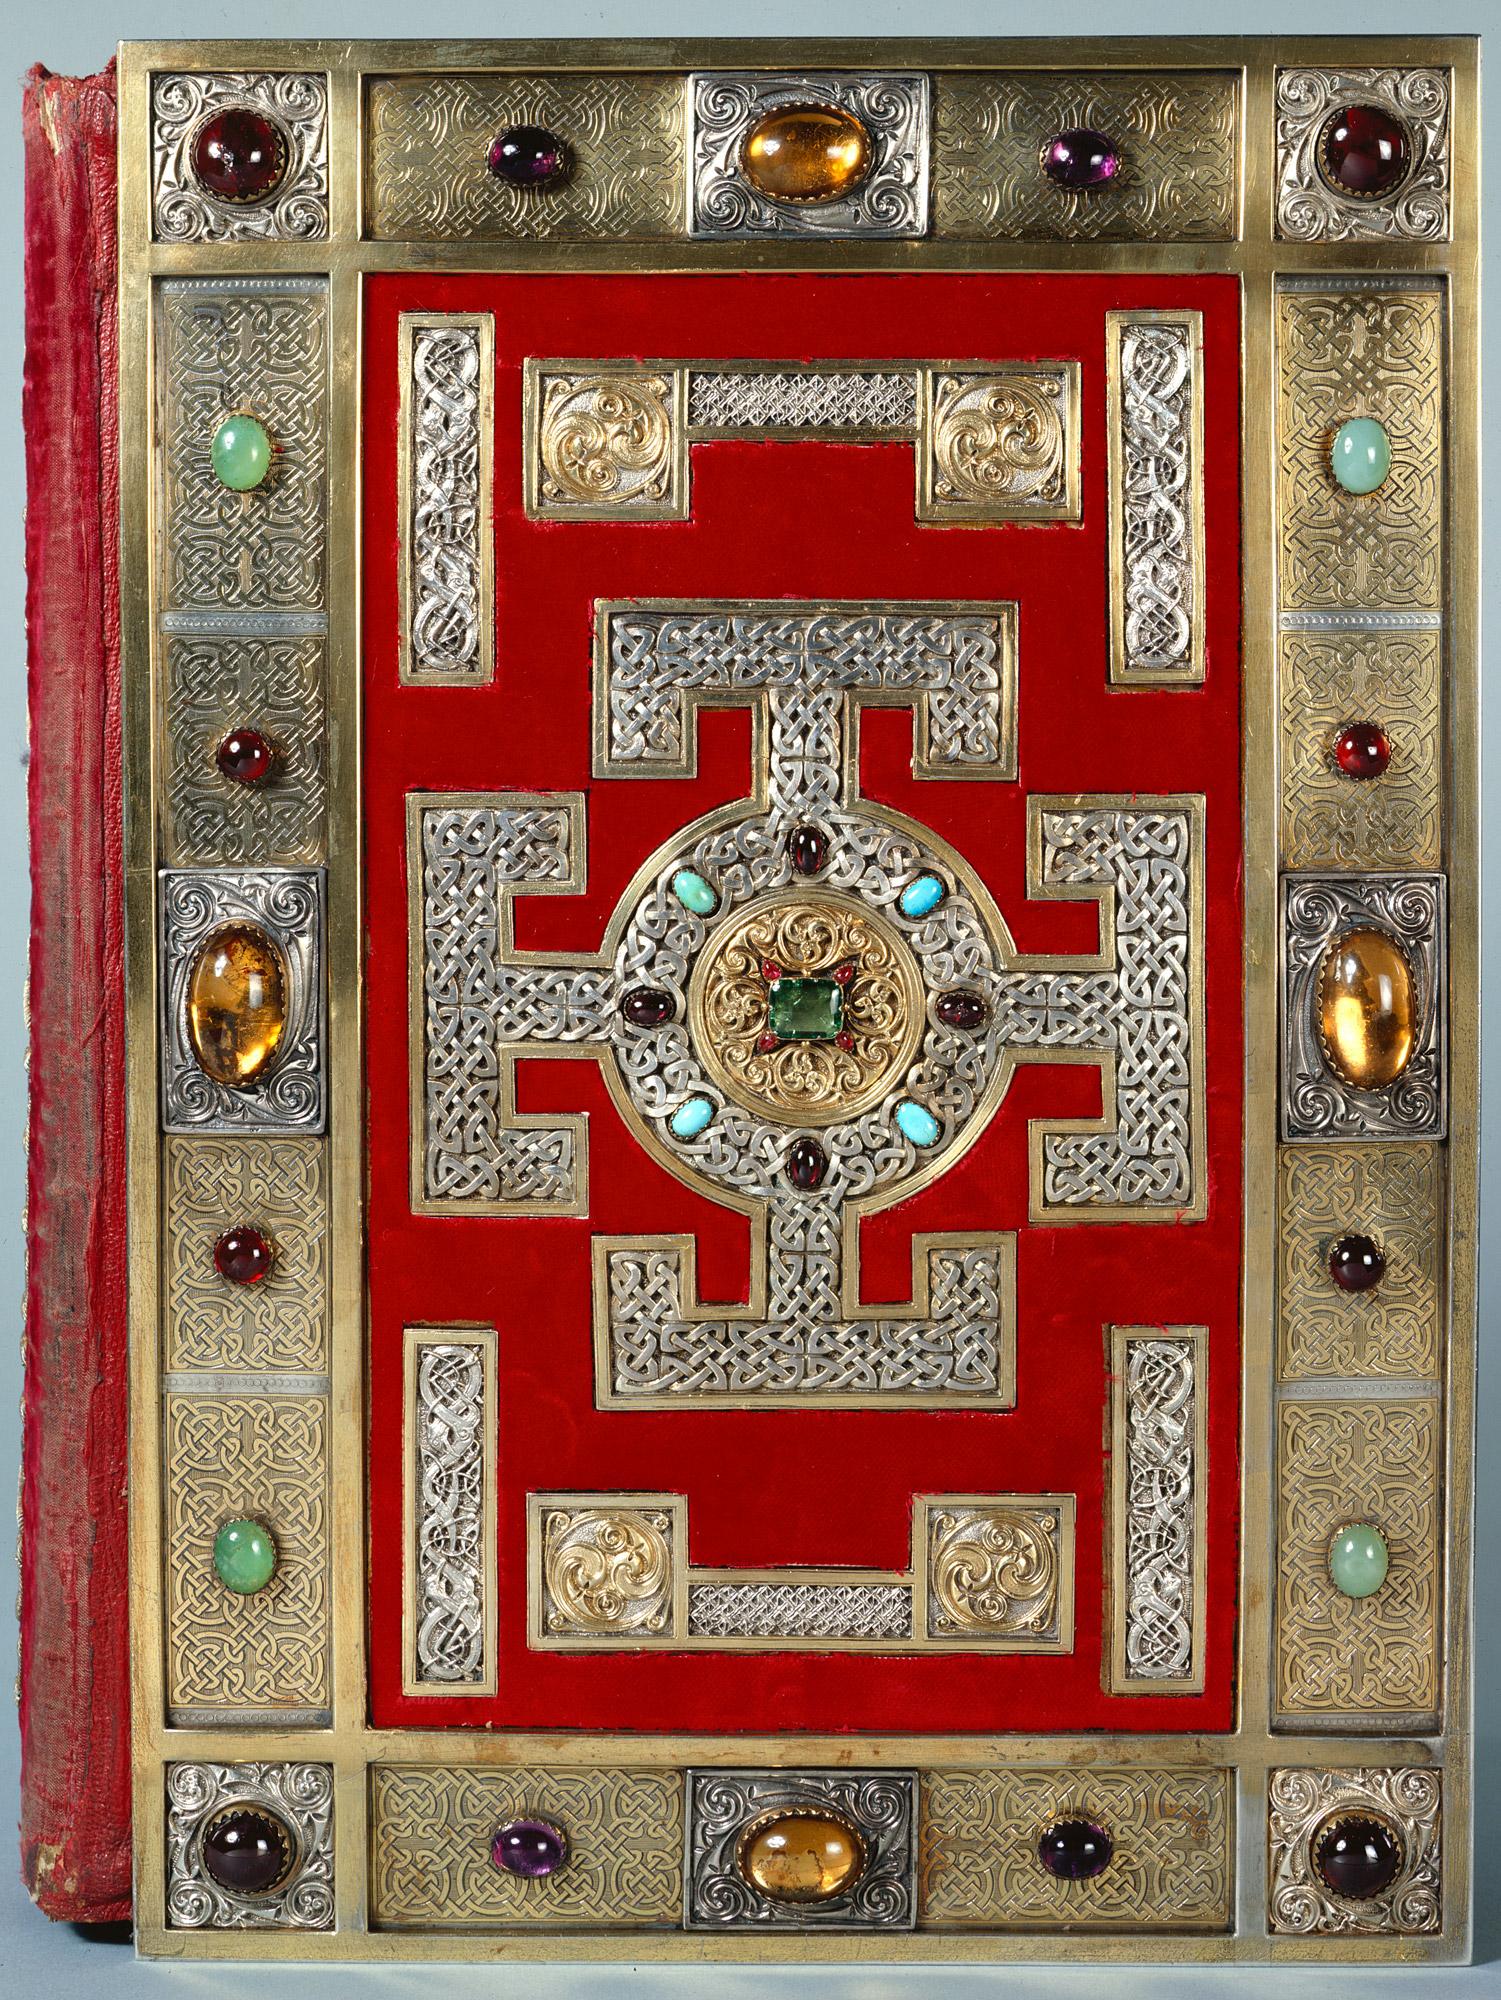 Lindisfarne Gospels - The British Library